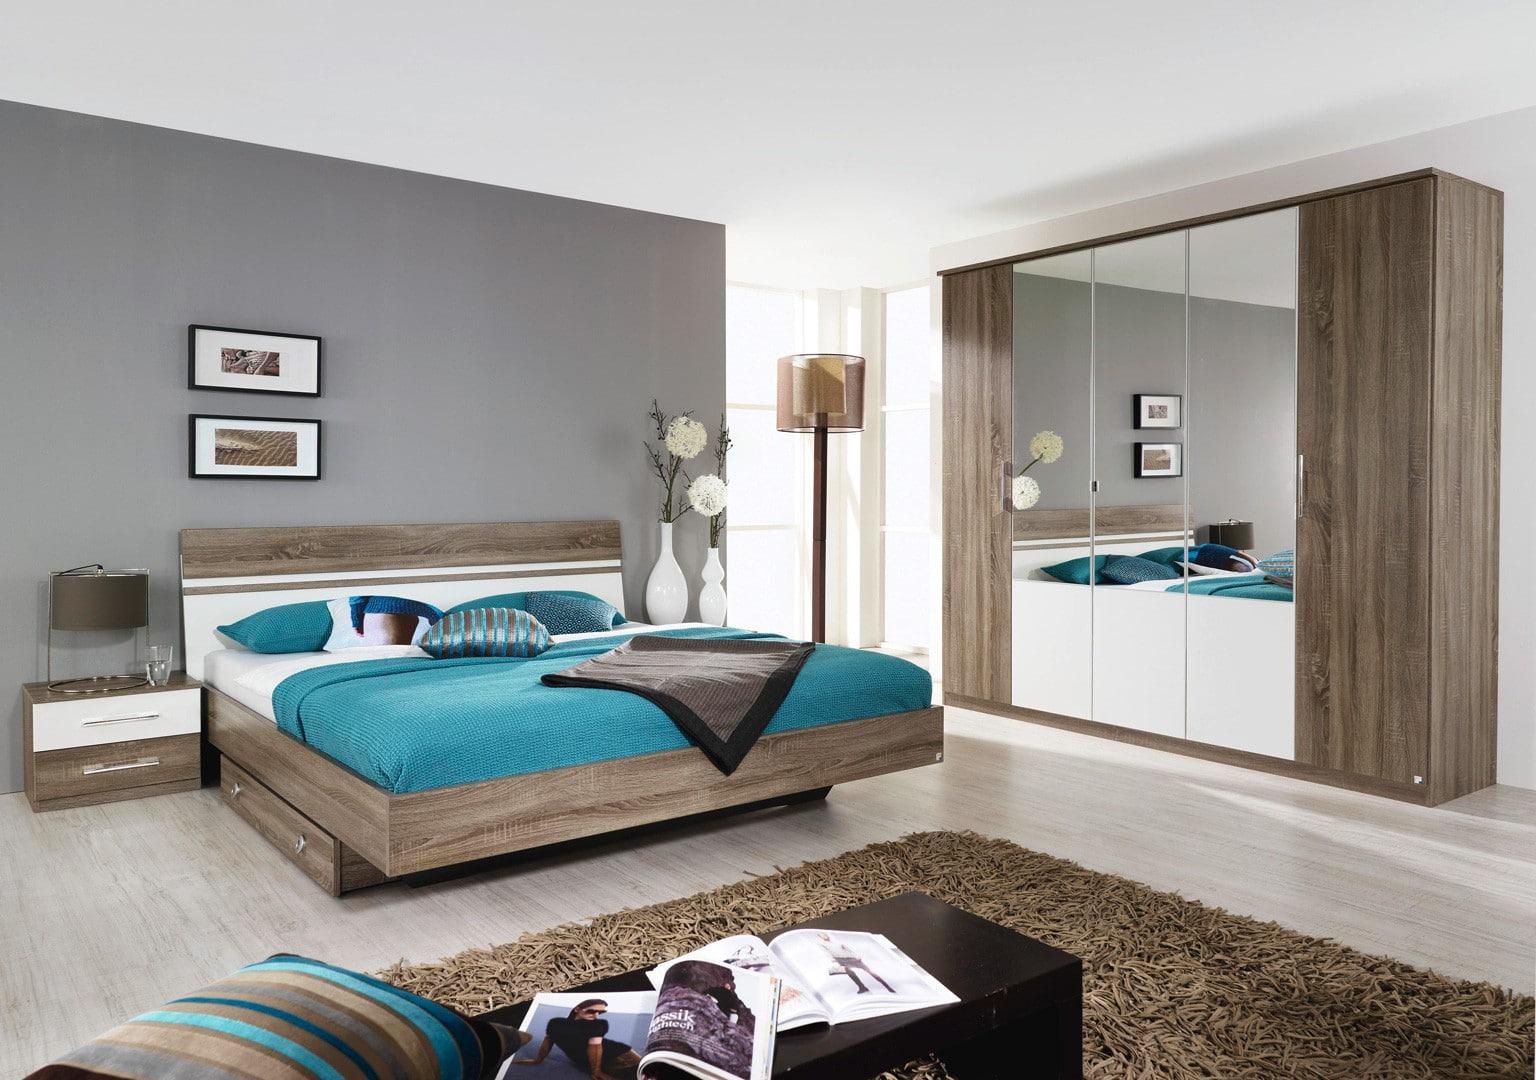 Ambiance chaleureuse dans la chambre coucher matelpro for Ambiance chambre adulte